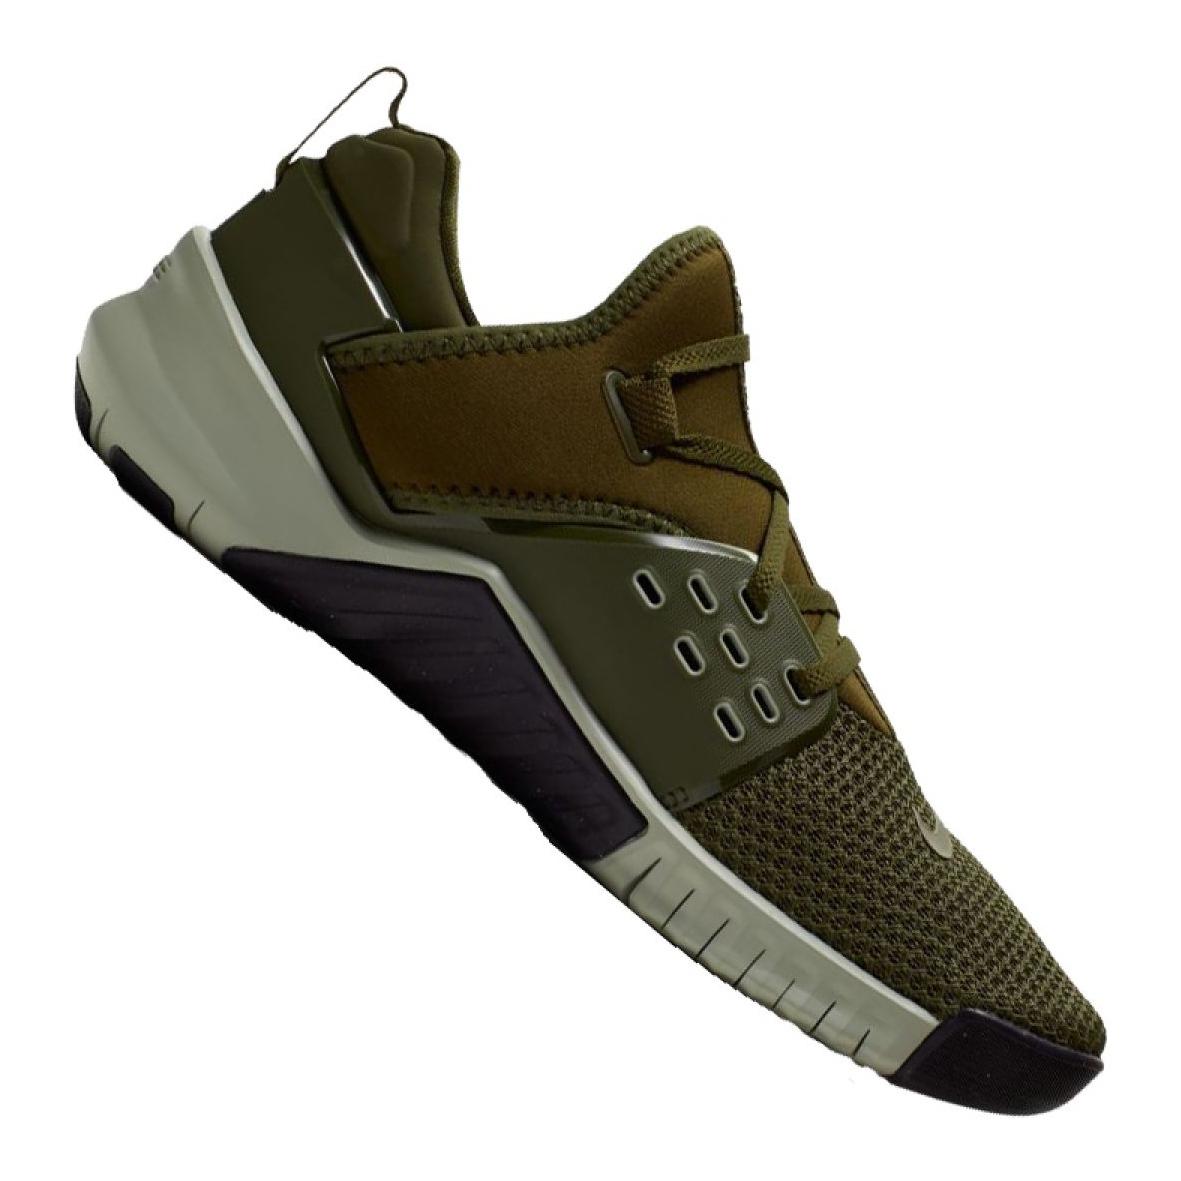 Buty treningowe Nike Free Trainer 3.0 V4 M 749361 033   Buty